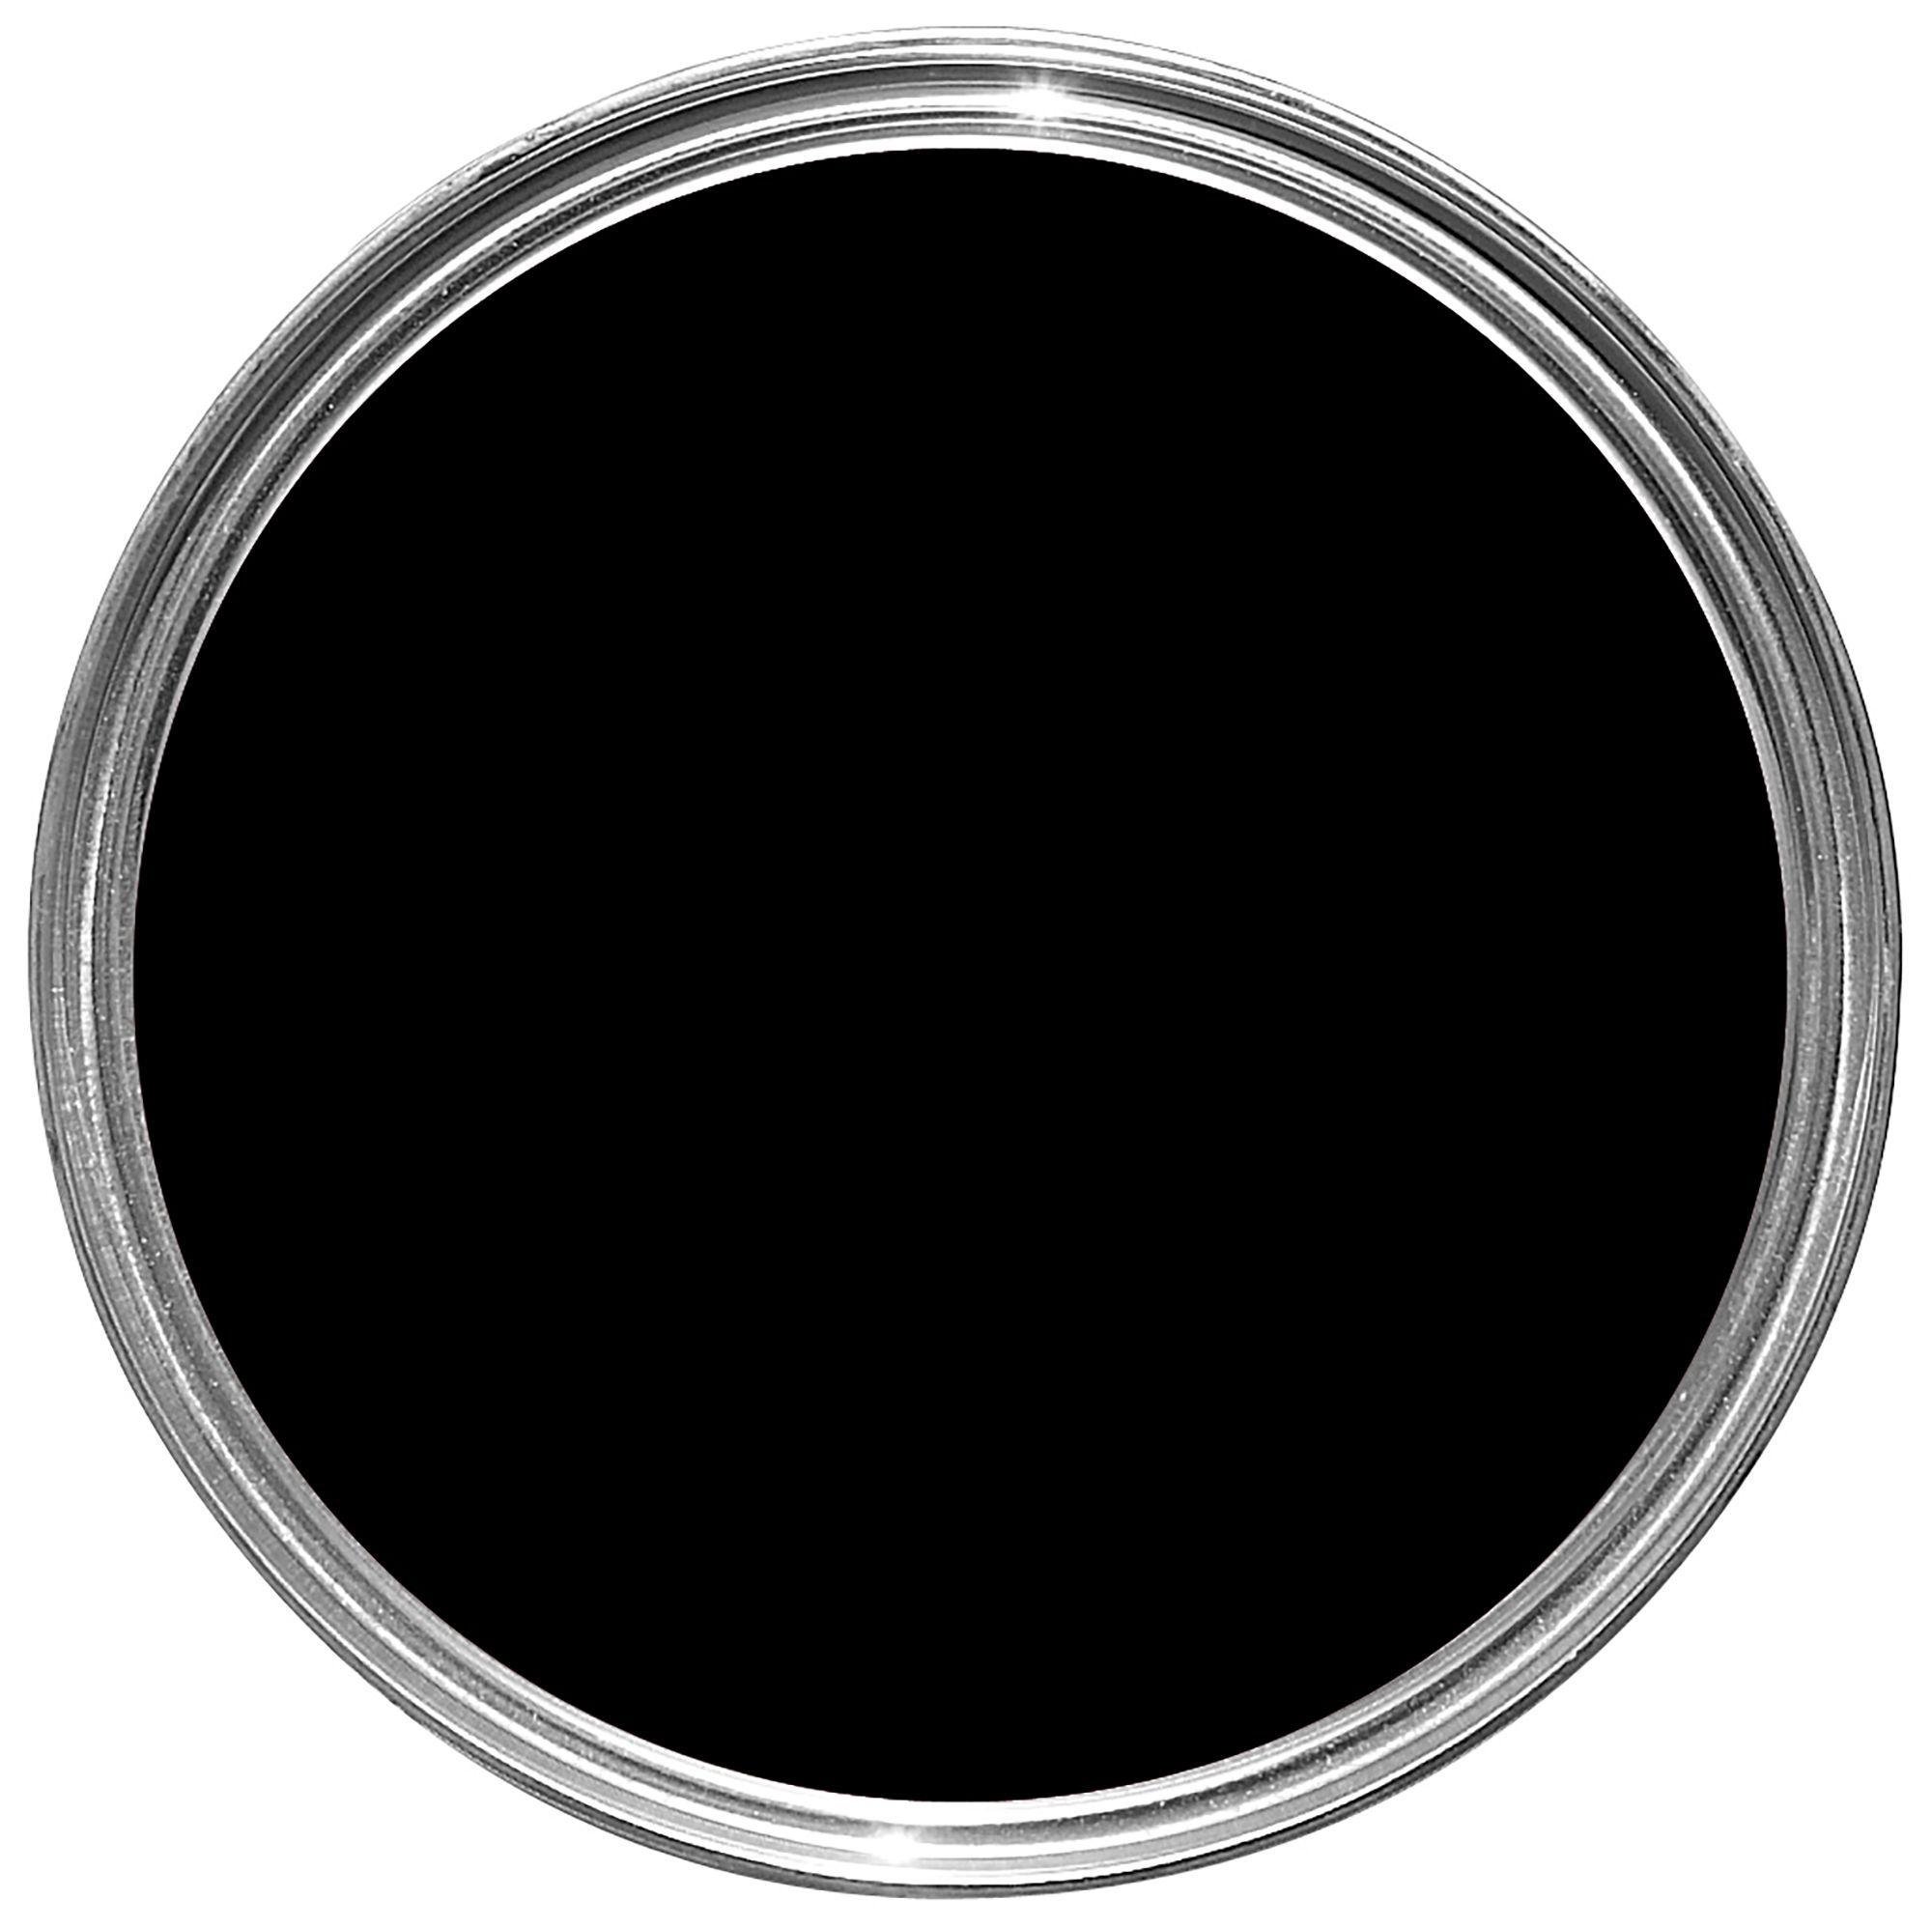 Ronseal Diamond Hard Black Satin Doorstep Paint 250ml Departments Diy At B Q